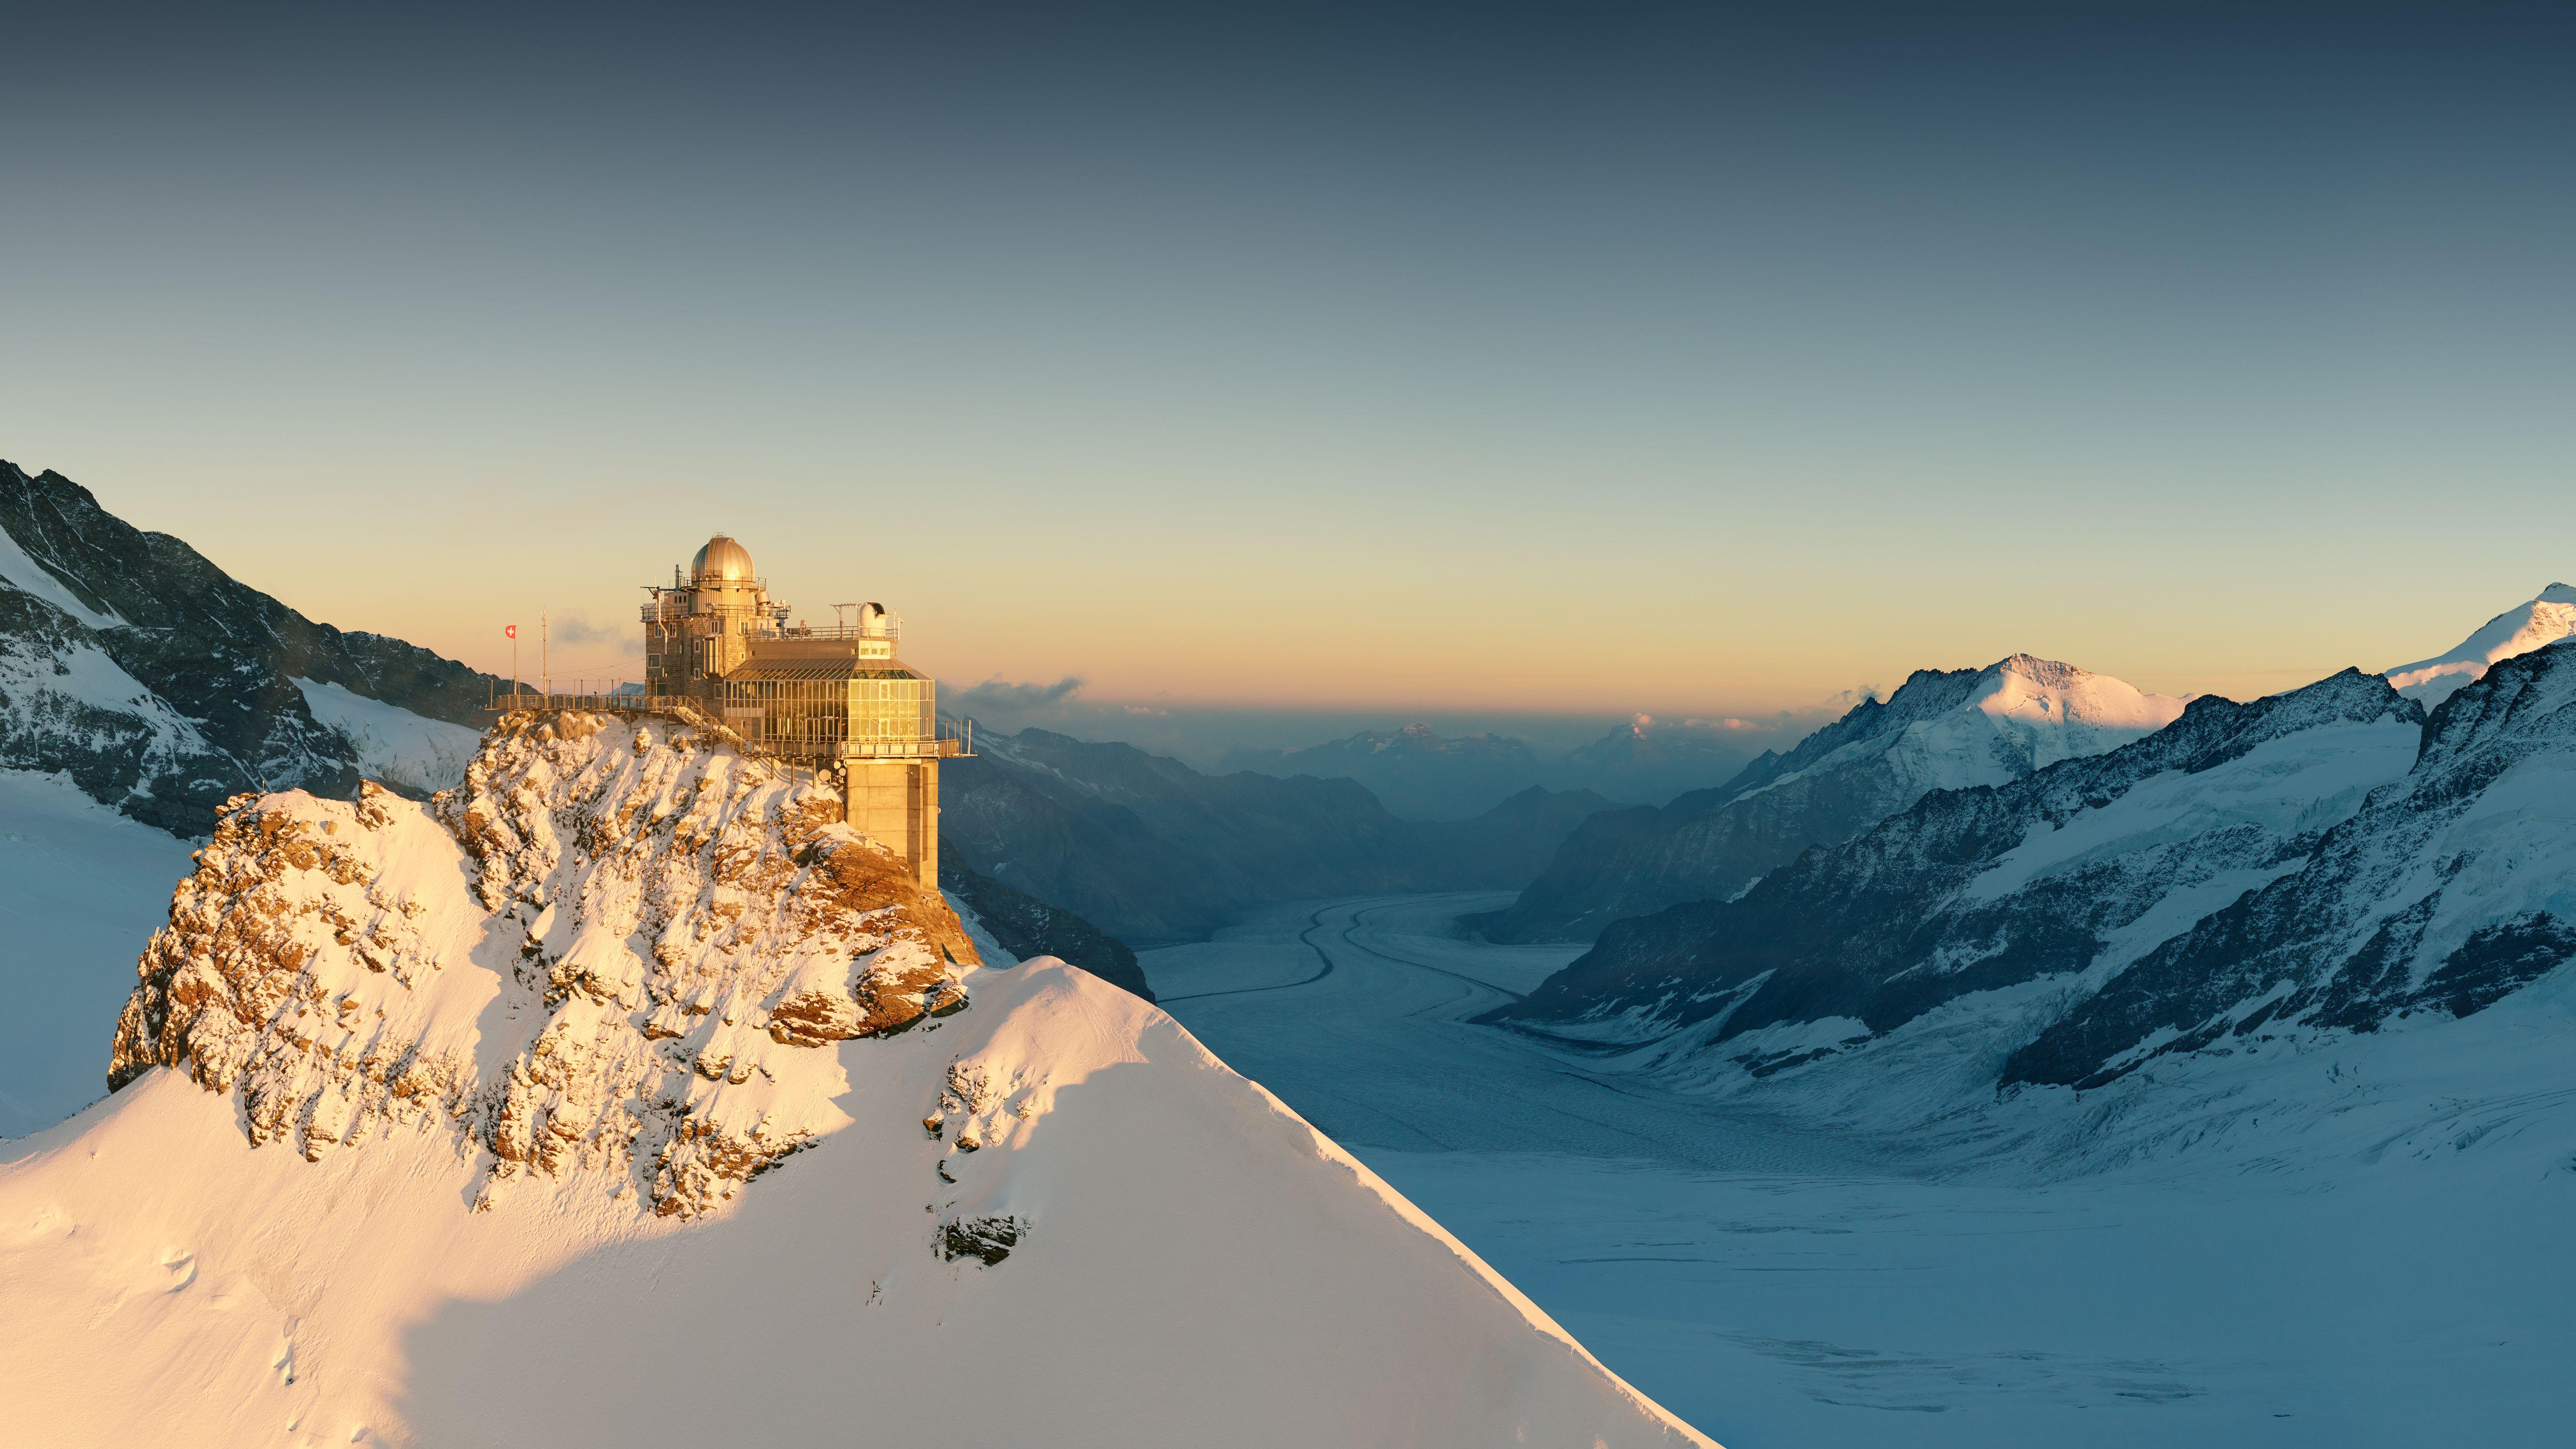 Sfinge di Jungfraujoch